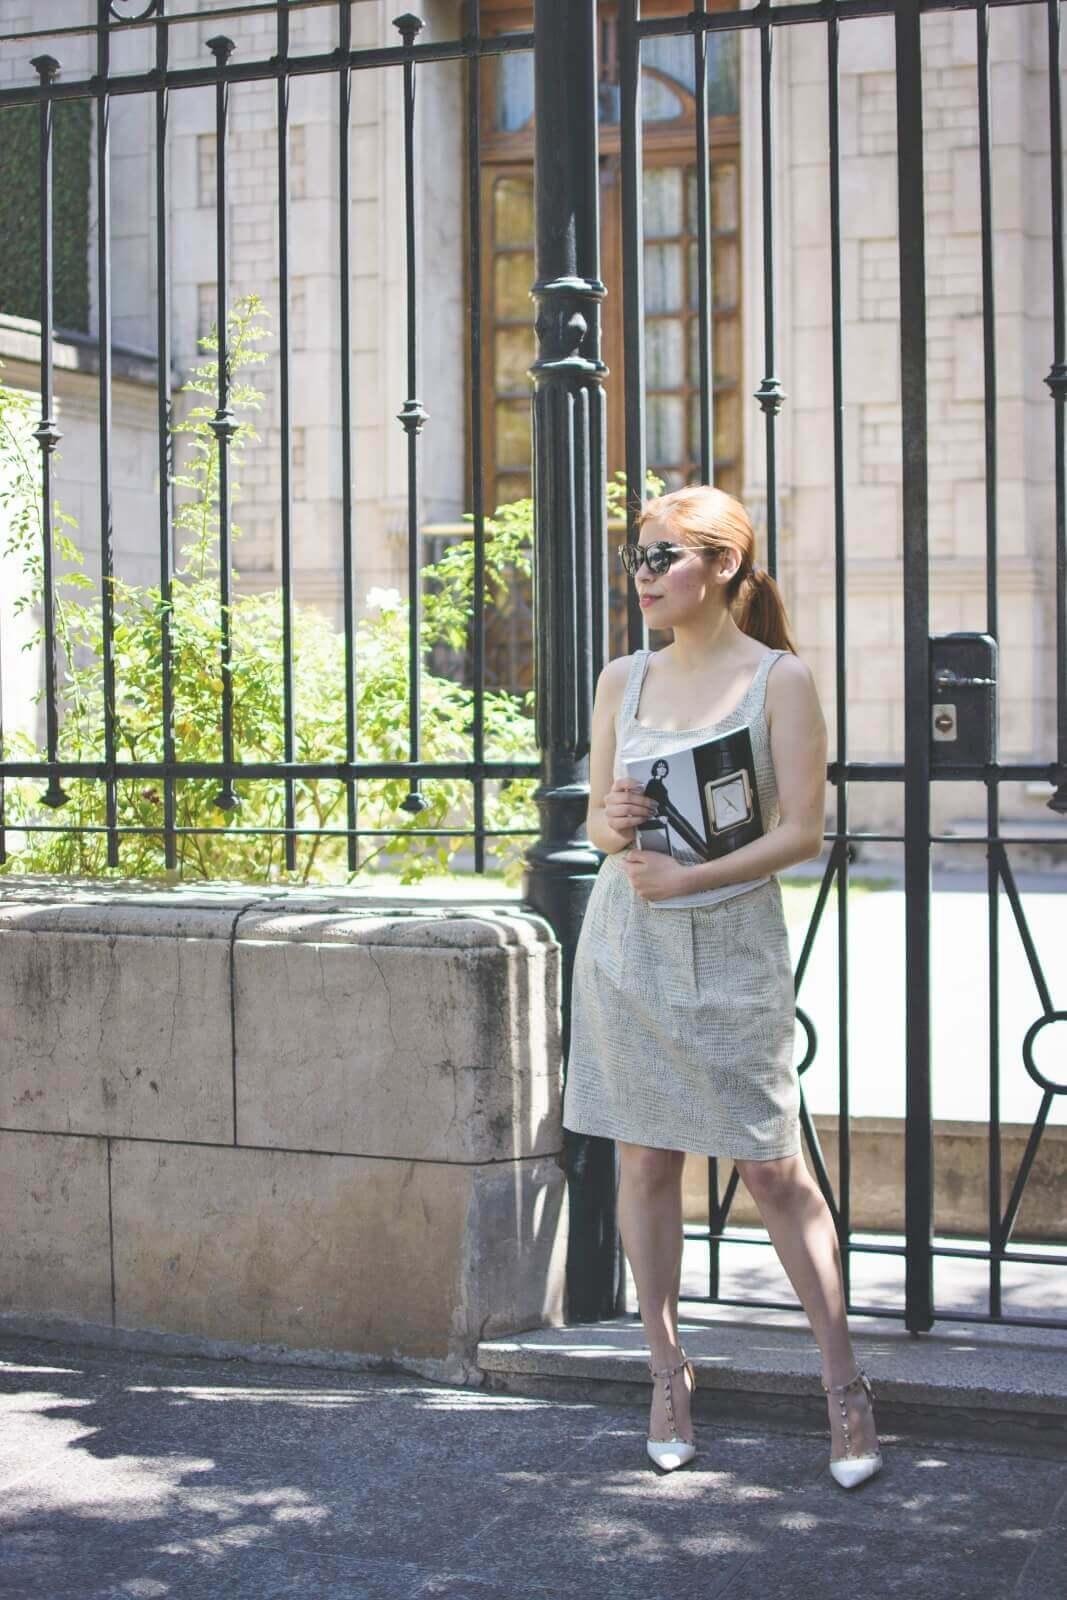 almond-white-dress-sammydress-stilettos-valentino-rockstud-imitation-deborah-ferrero-style-by-deb-ladylike15